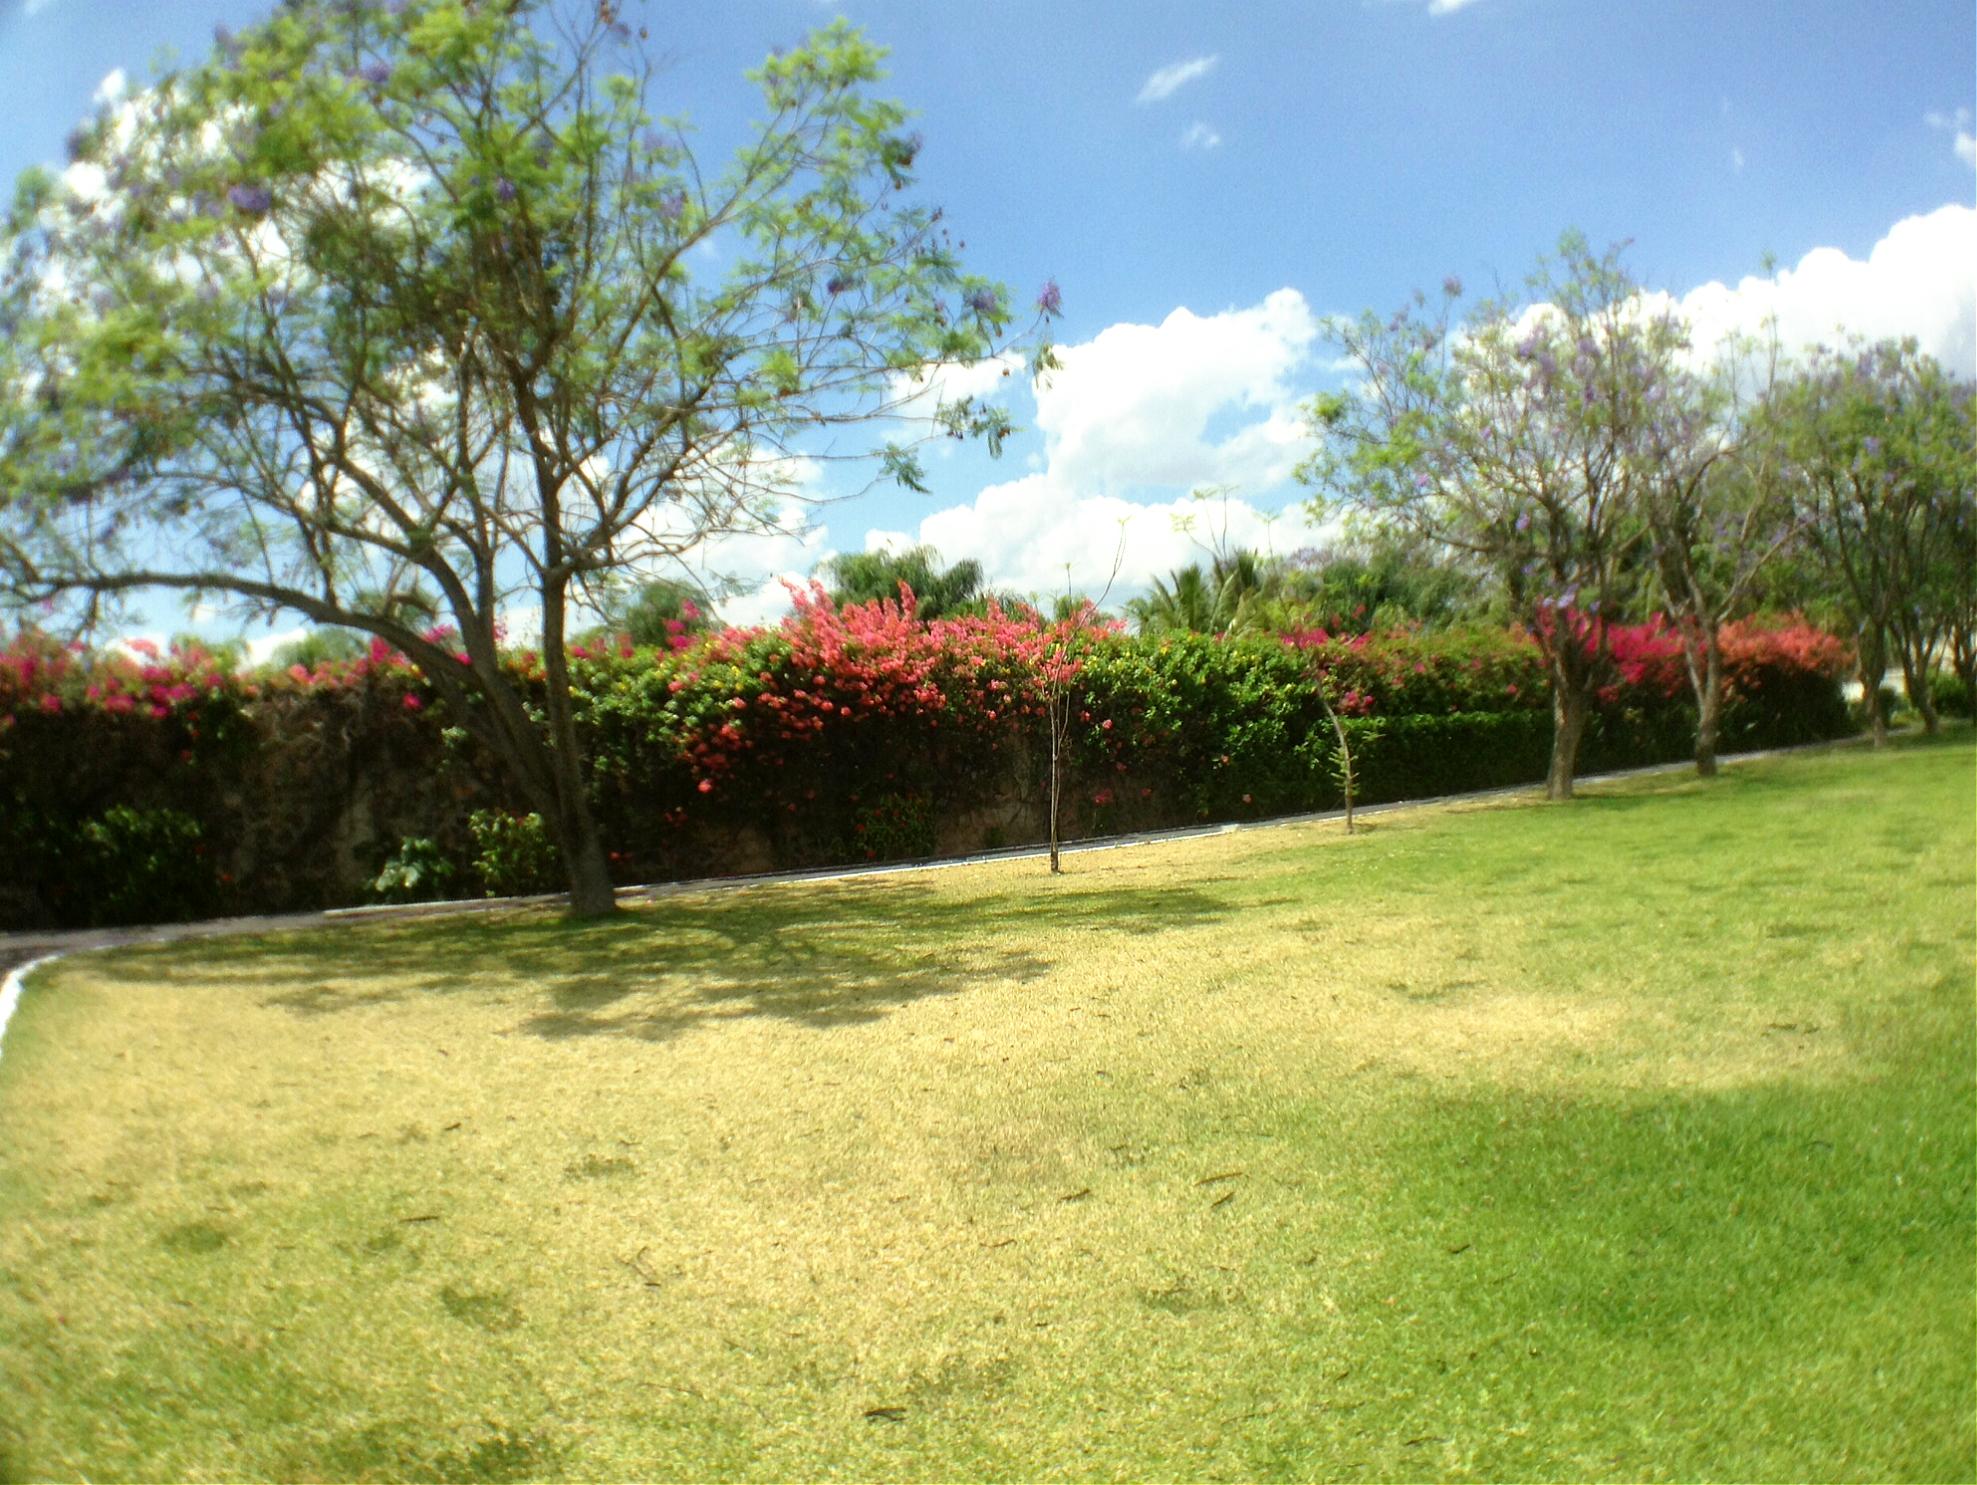 Jardines villa toscana 5.jpg